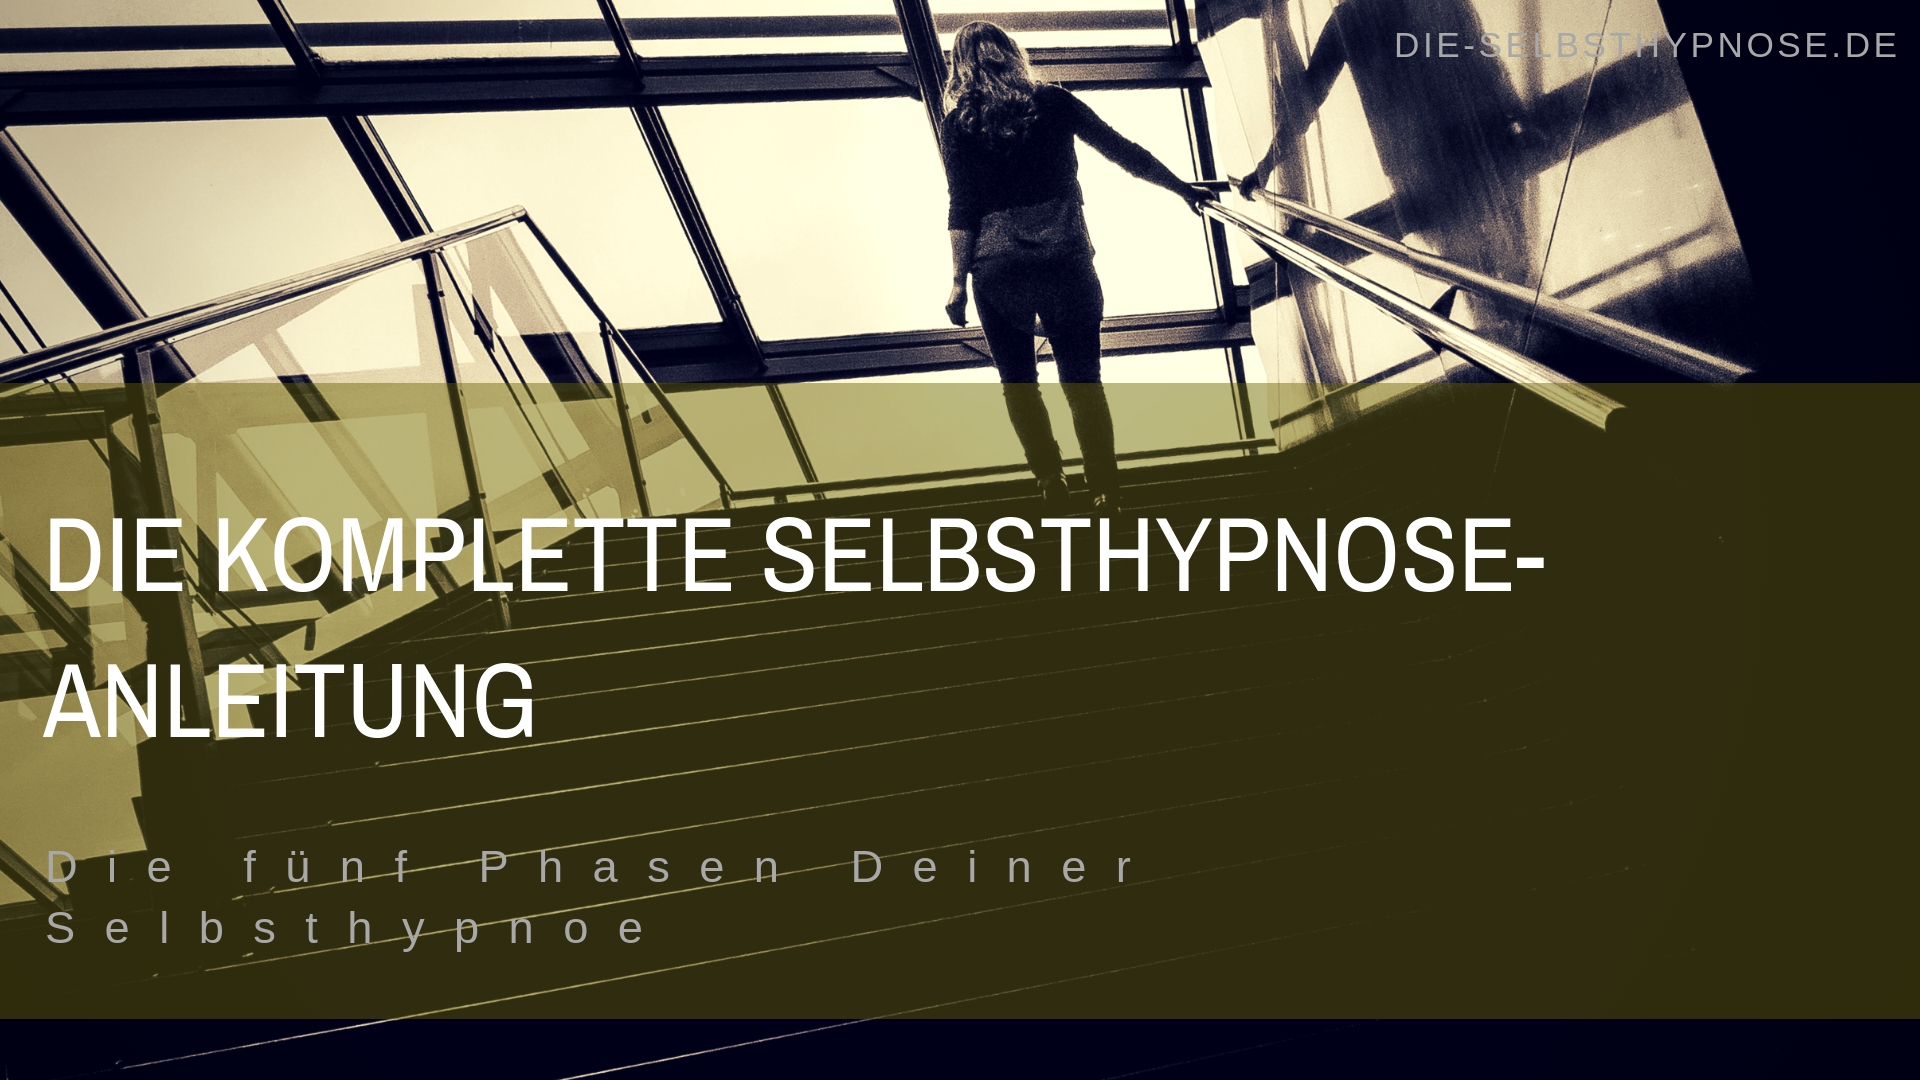 Die Selbsthypnose-Anleitung